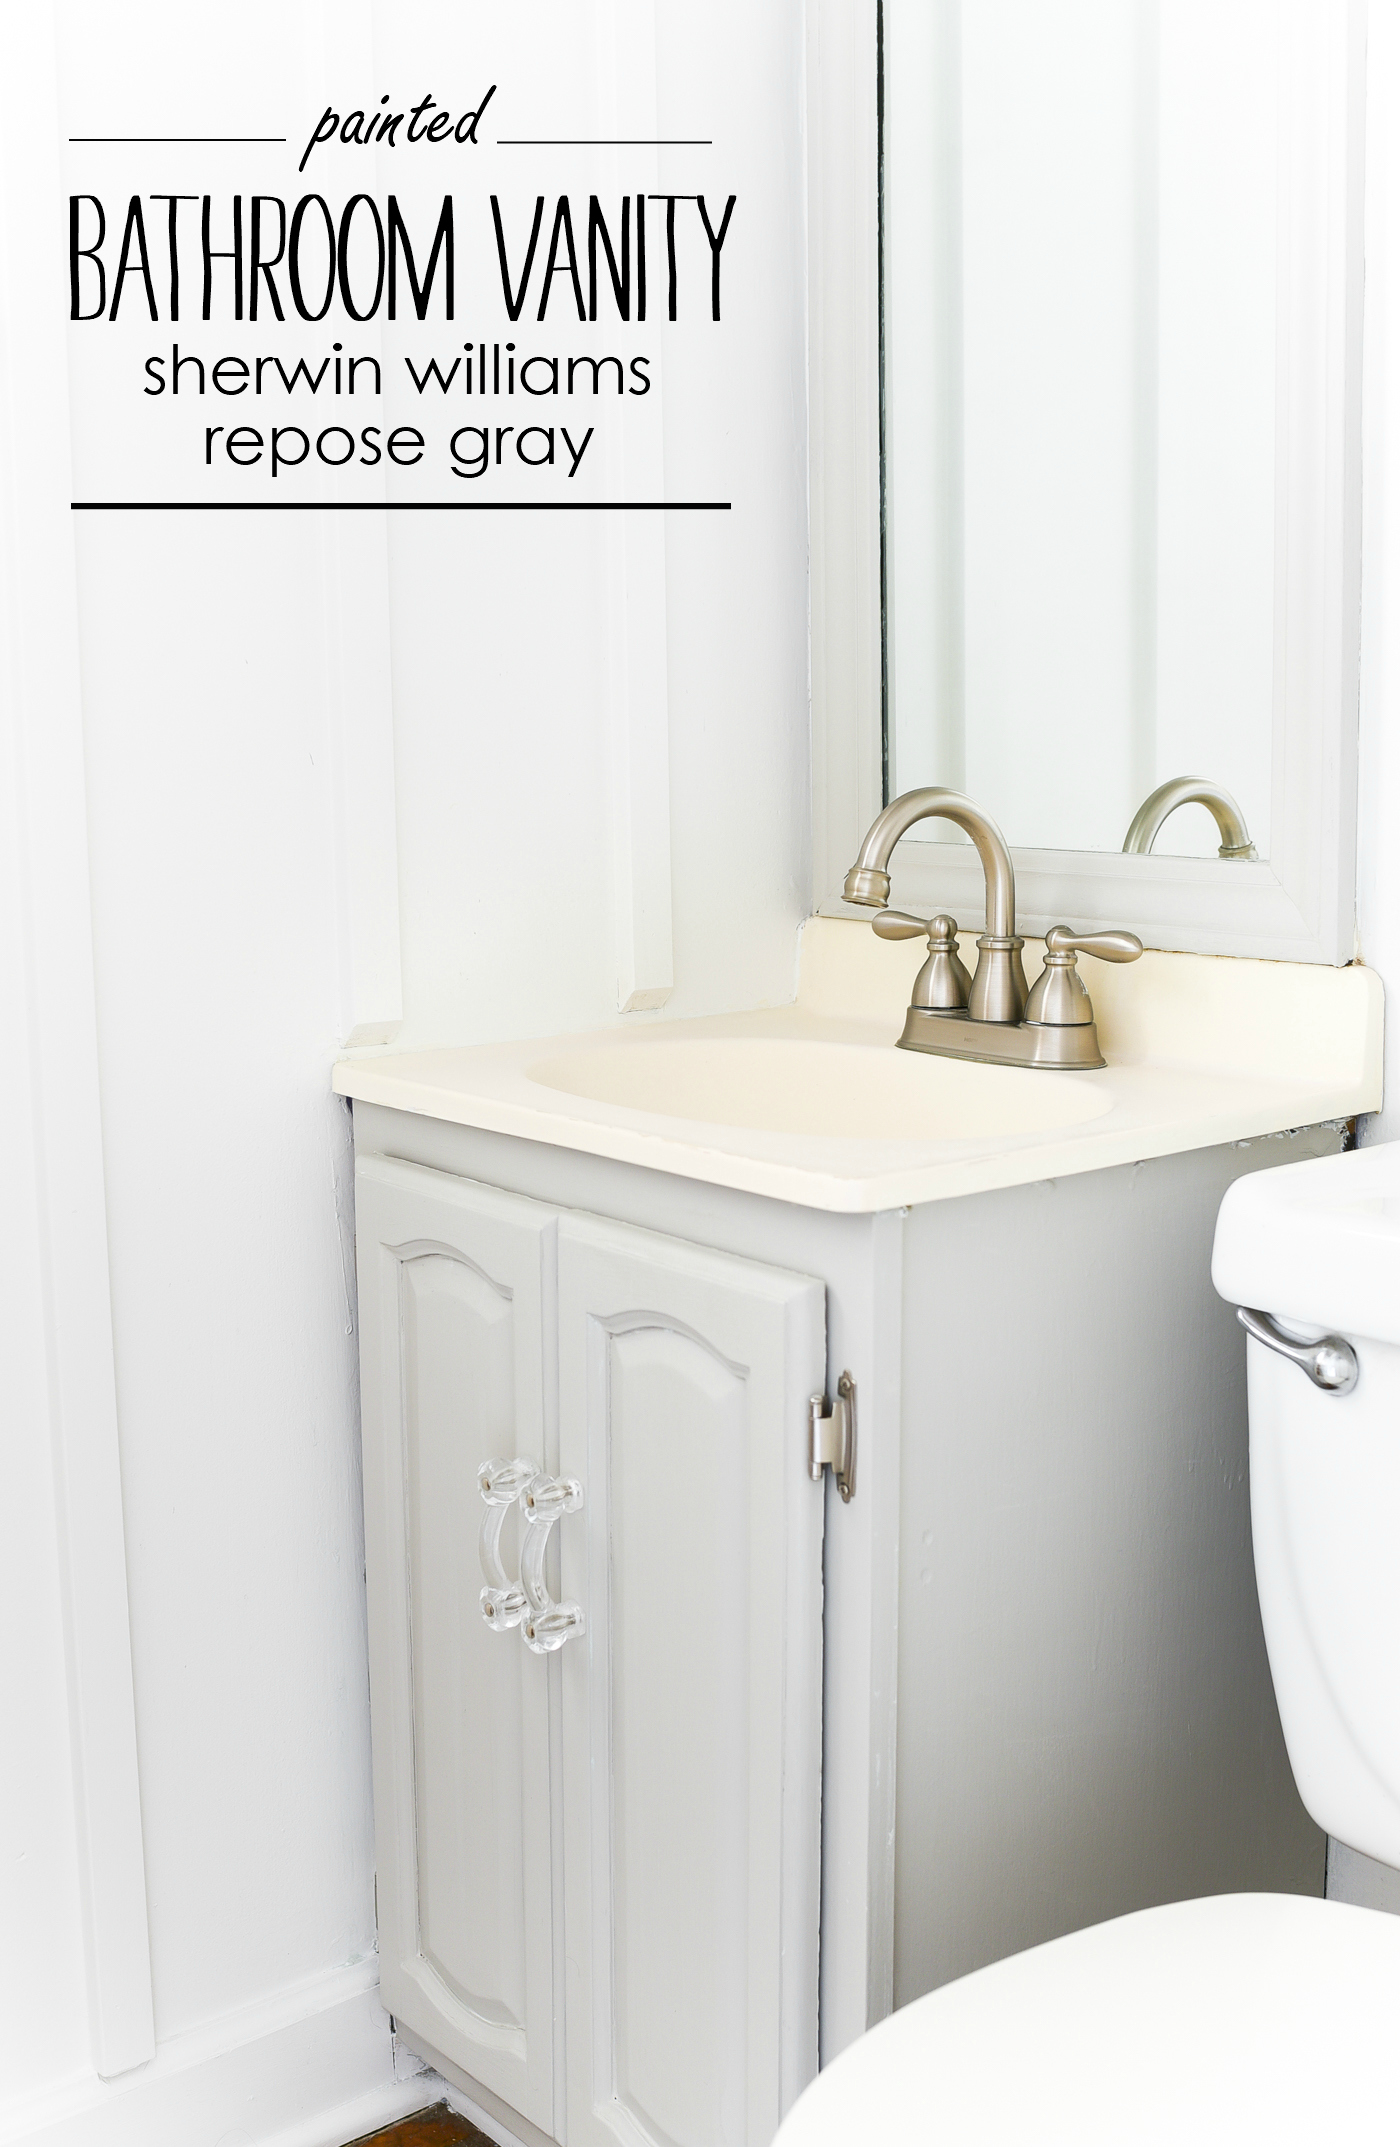 Painted Gray Bathroom Vanity Cabinet Sherwin Williams Repose